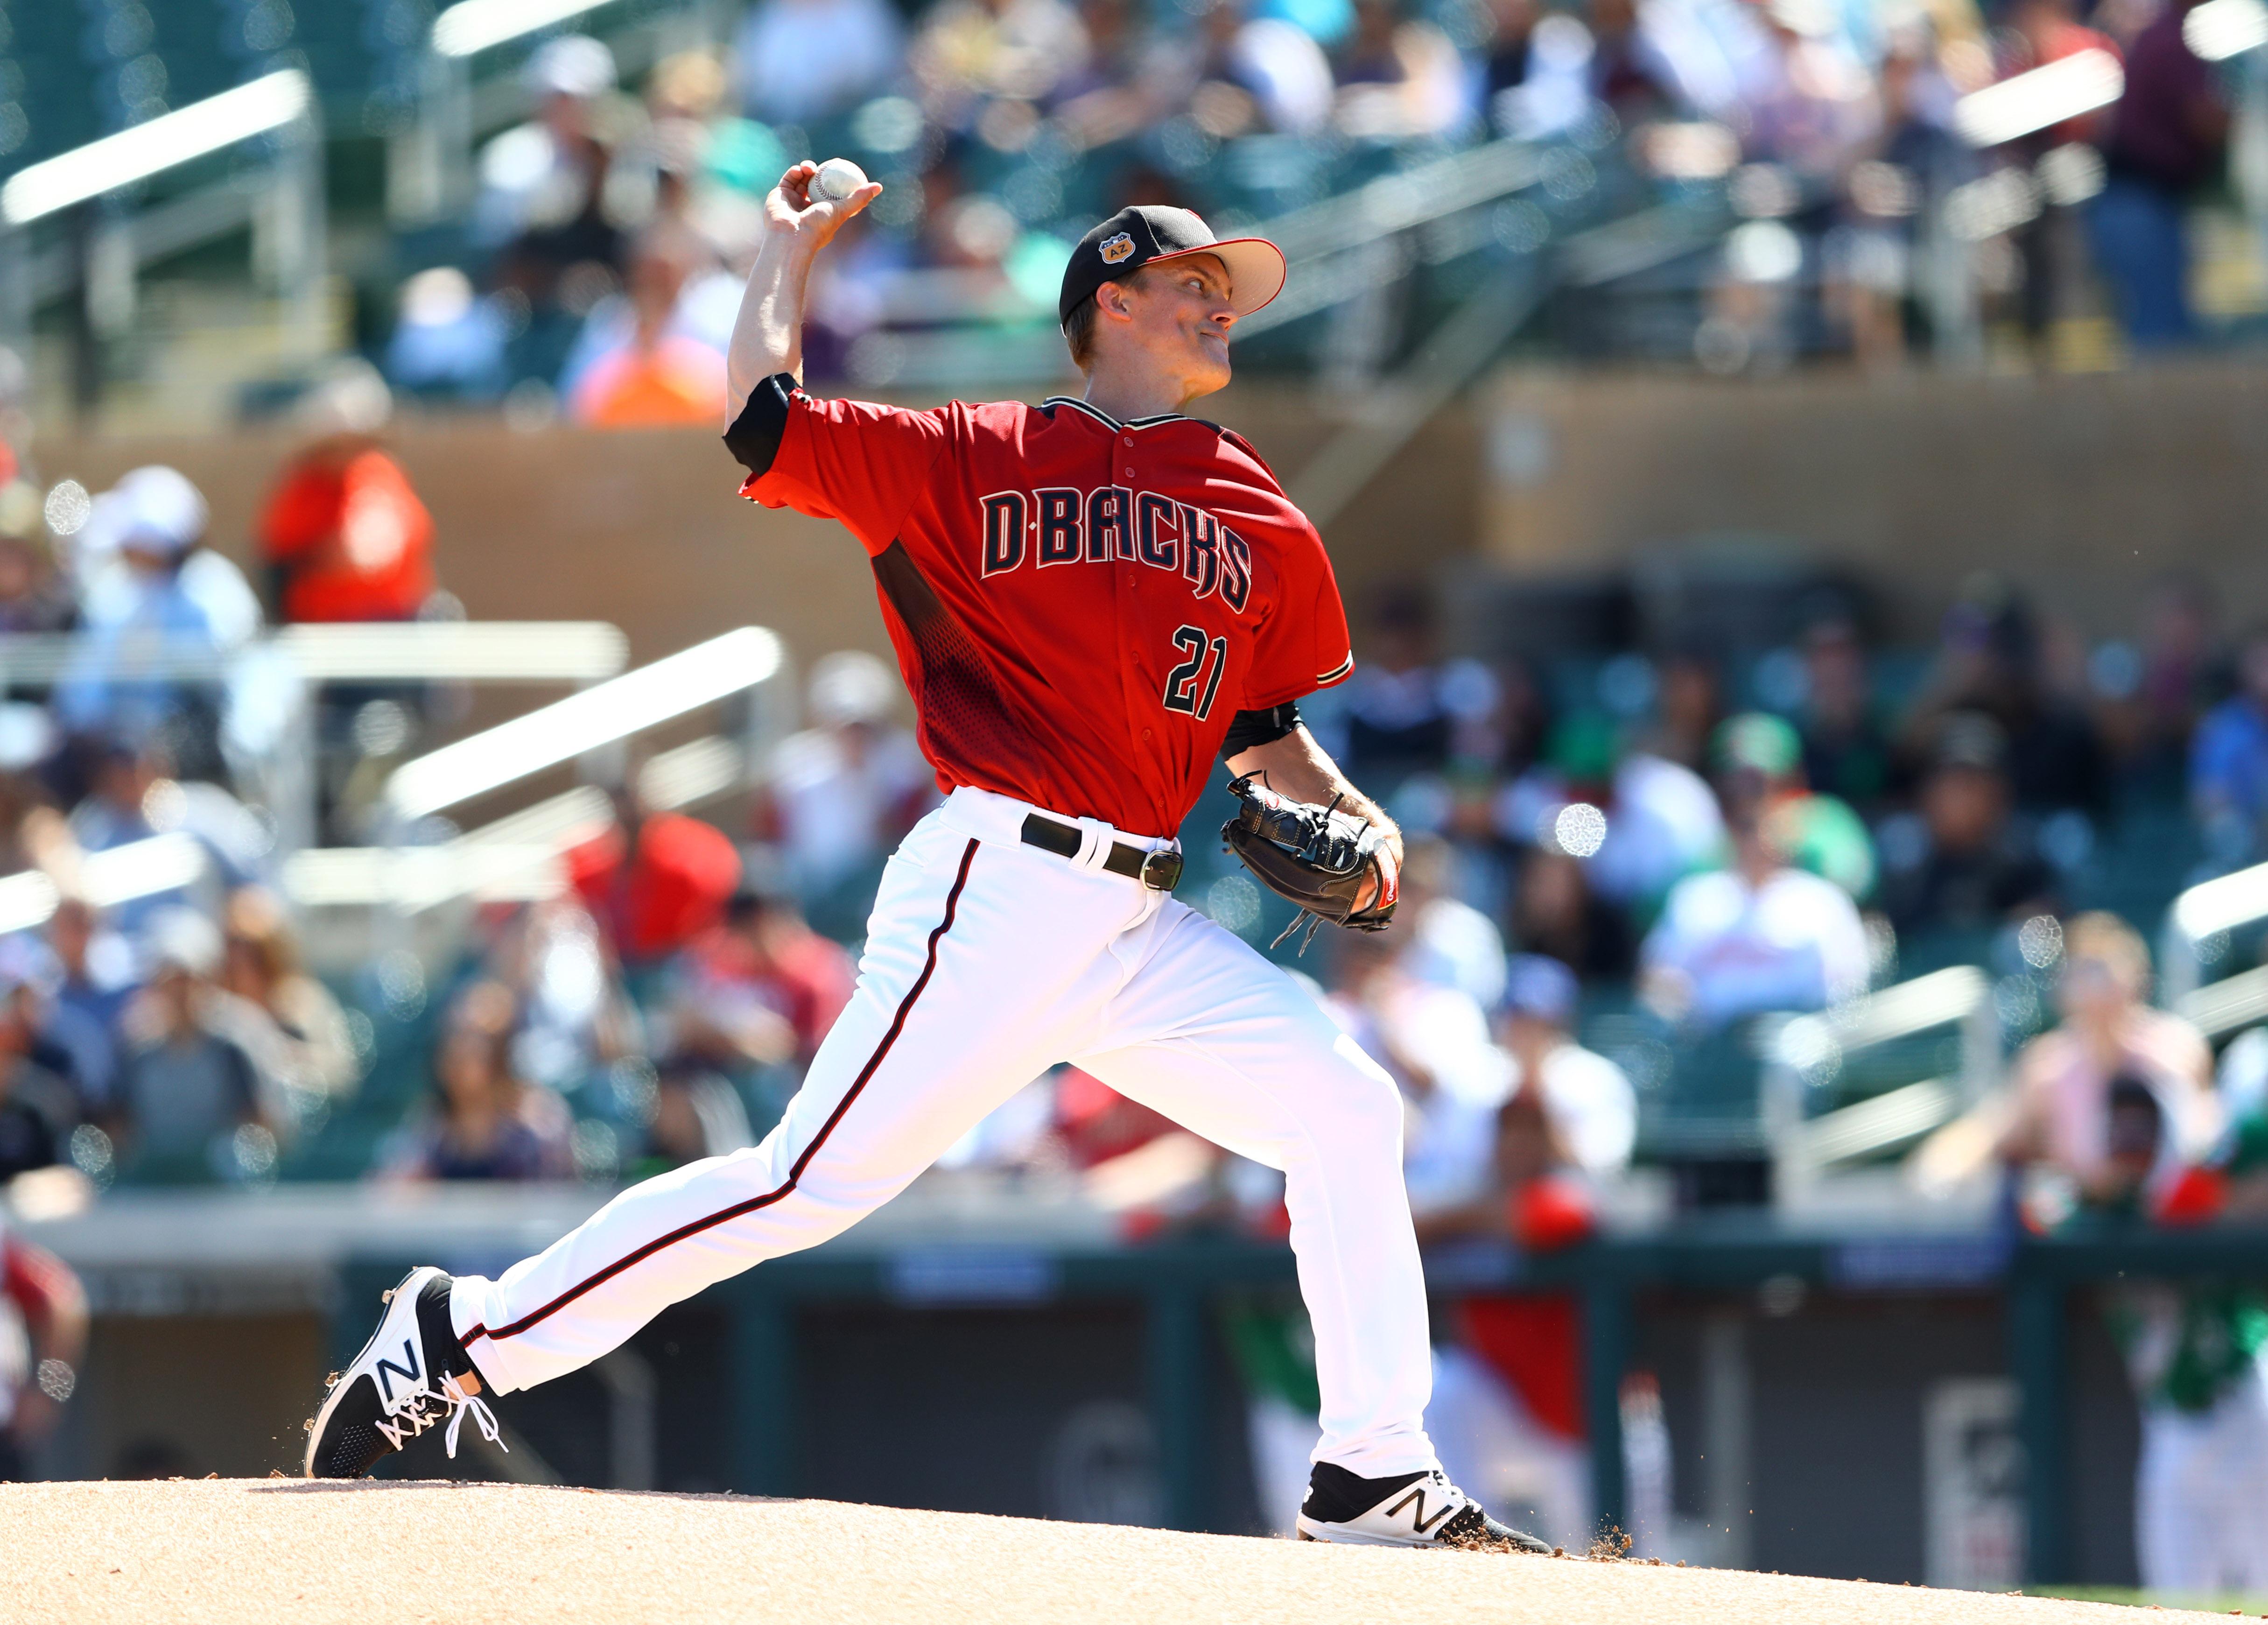 9974706-baseball-world-baseball-classic-exhibion-game-mexico-at-arizona-diamondbacks